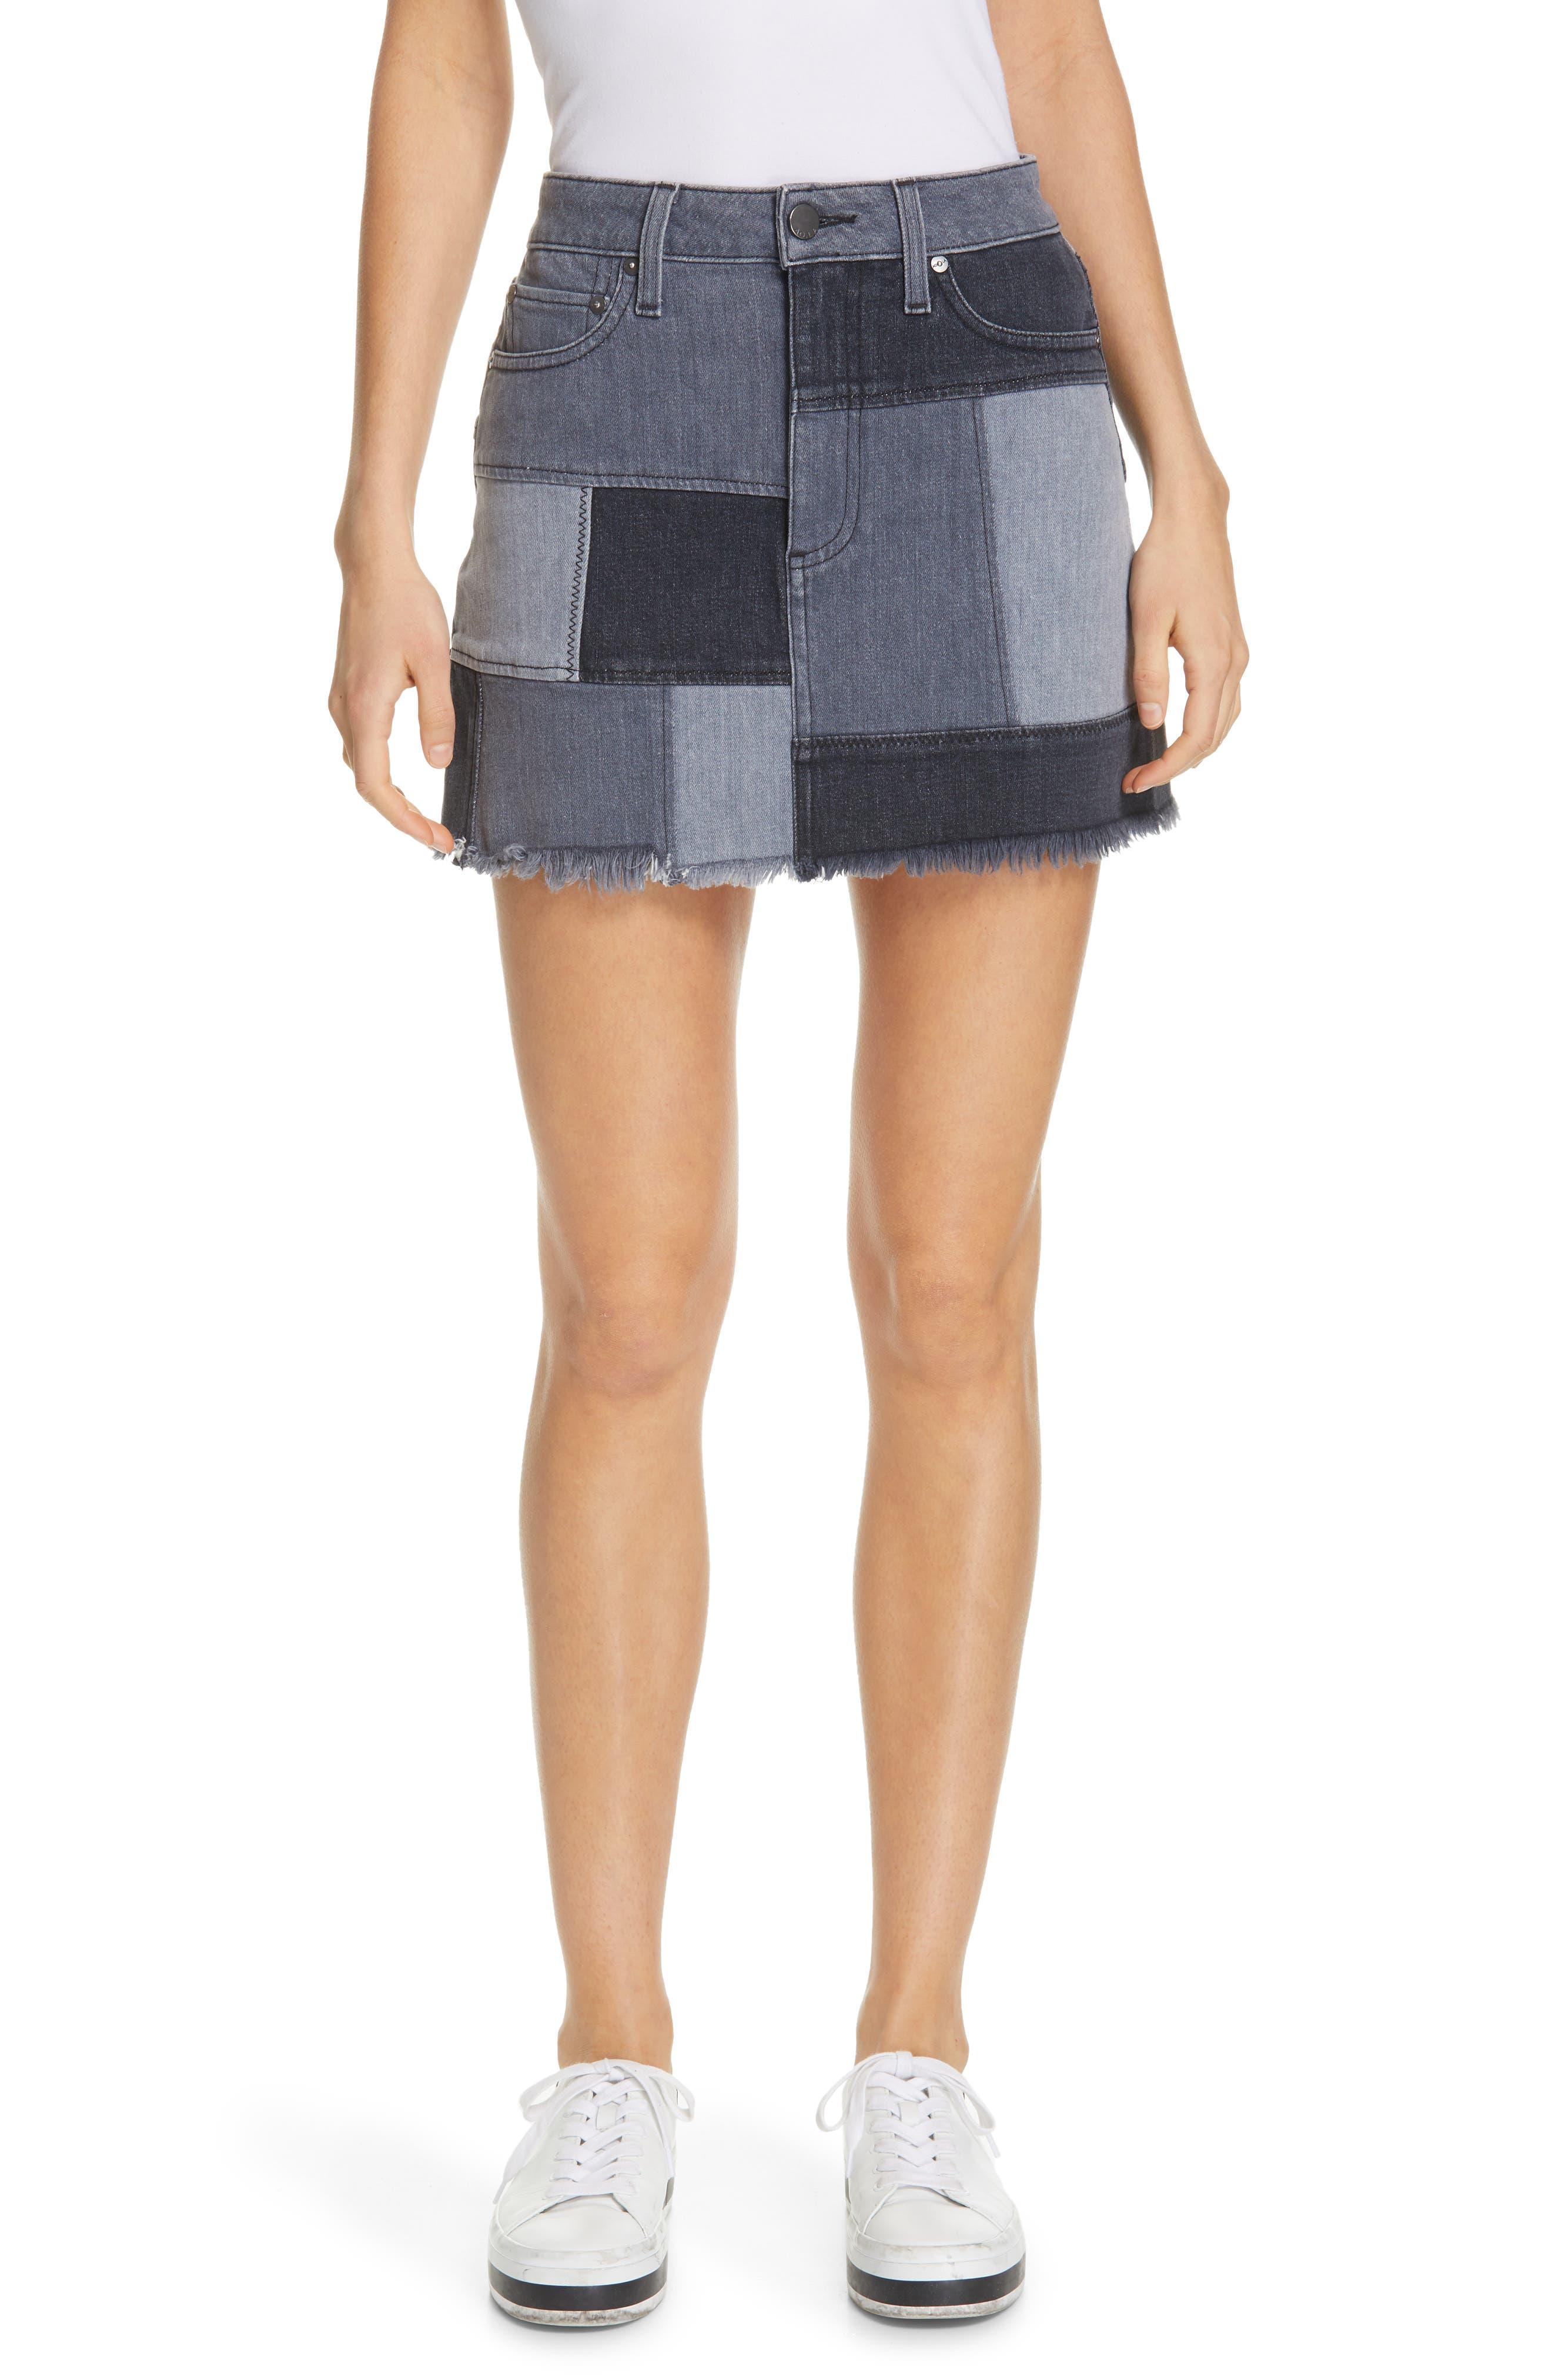 ALICE + OLIVIA JEANS,                             Amazing Patchwork Denim Miniskirt,                             Main thumbnail 1, color,                             NIGHT SKY